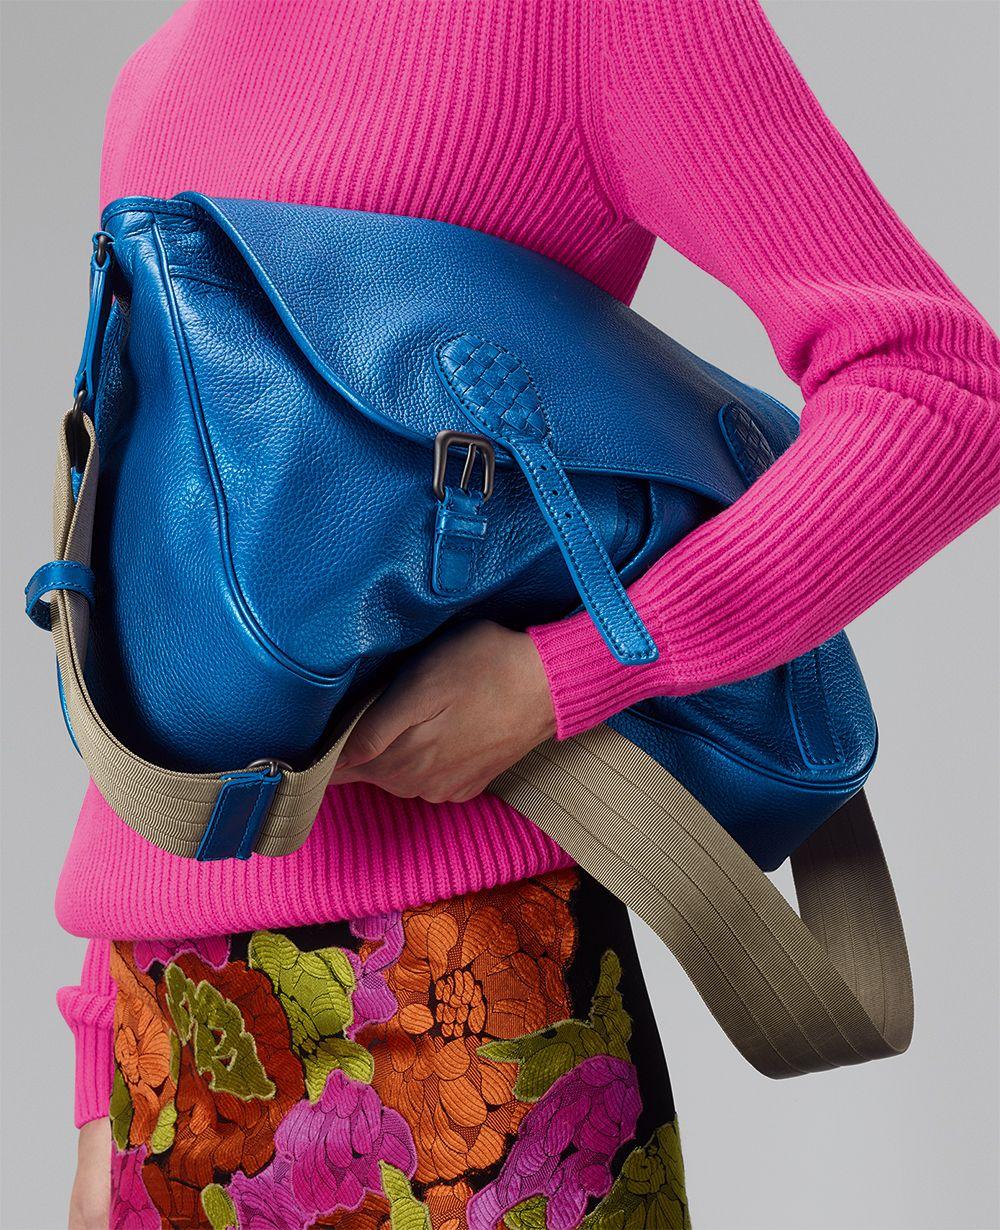 Bottega Veneta Signal Blue Intrecciato Nappa Gardena Bag  6625e6757fc5a